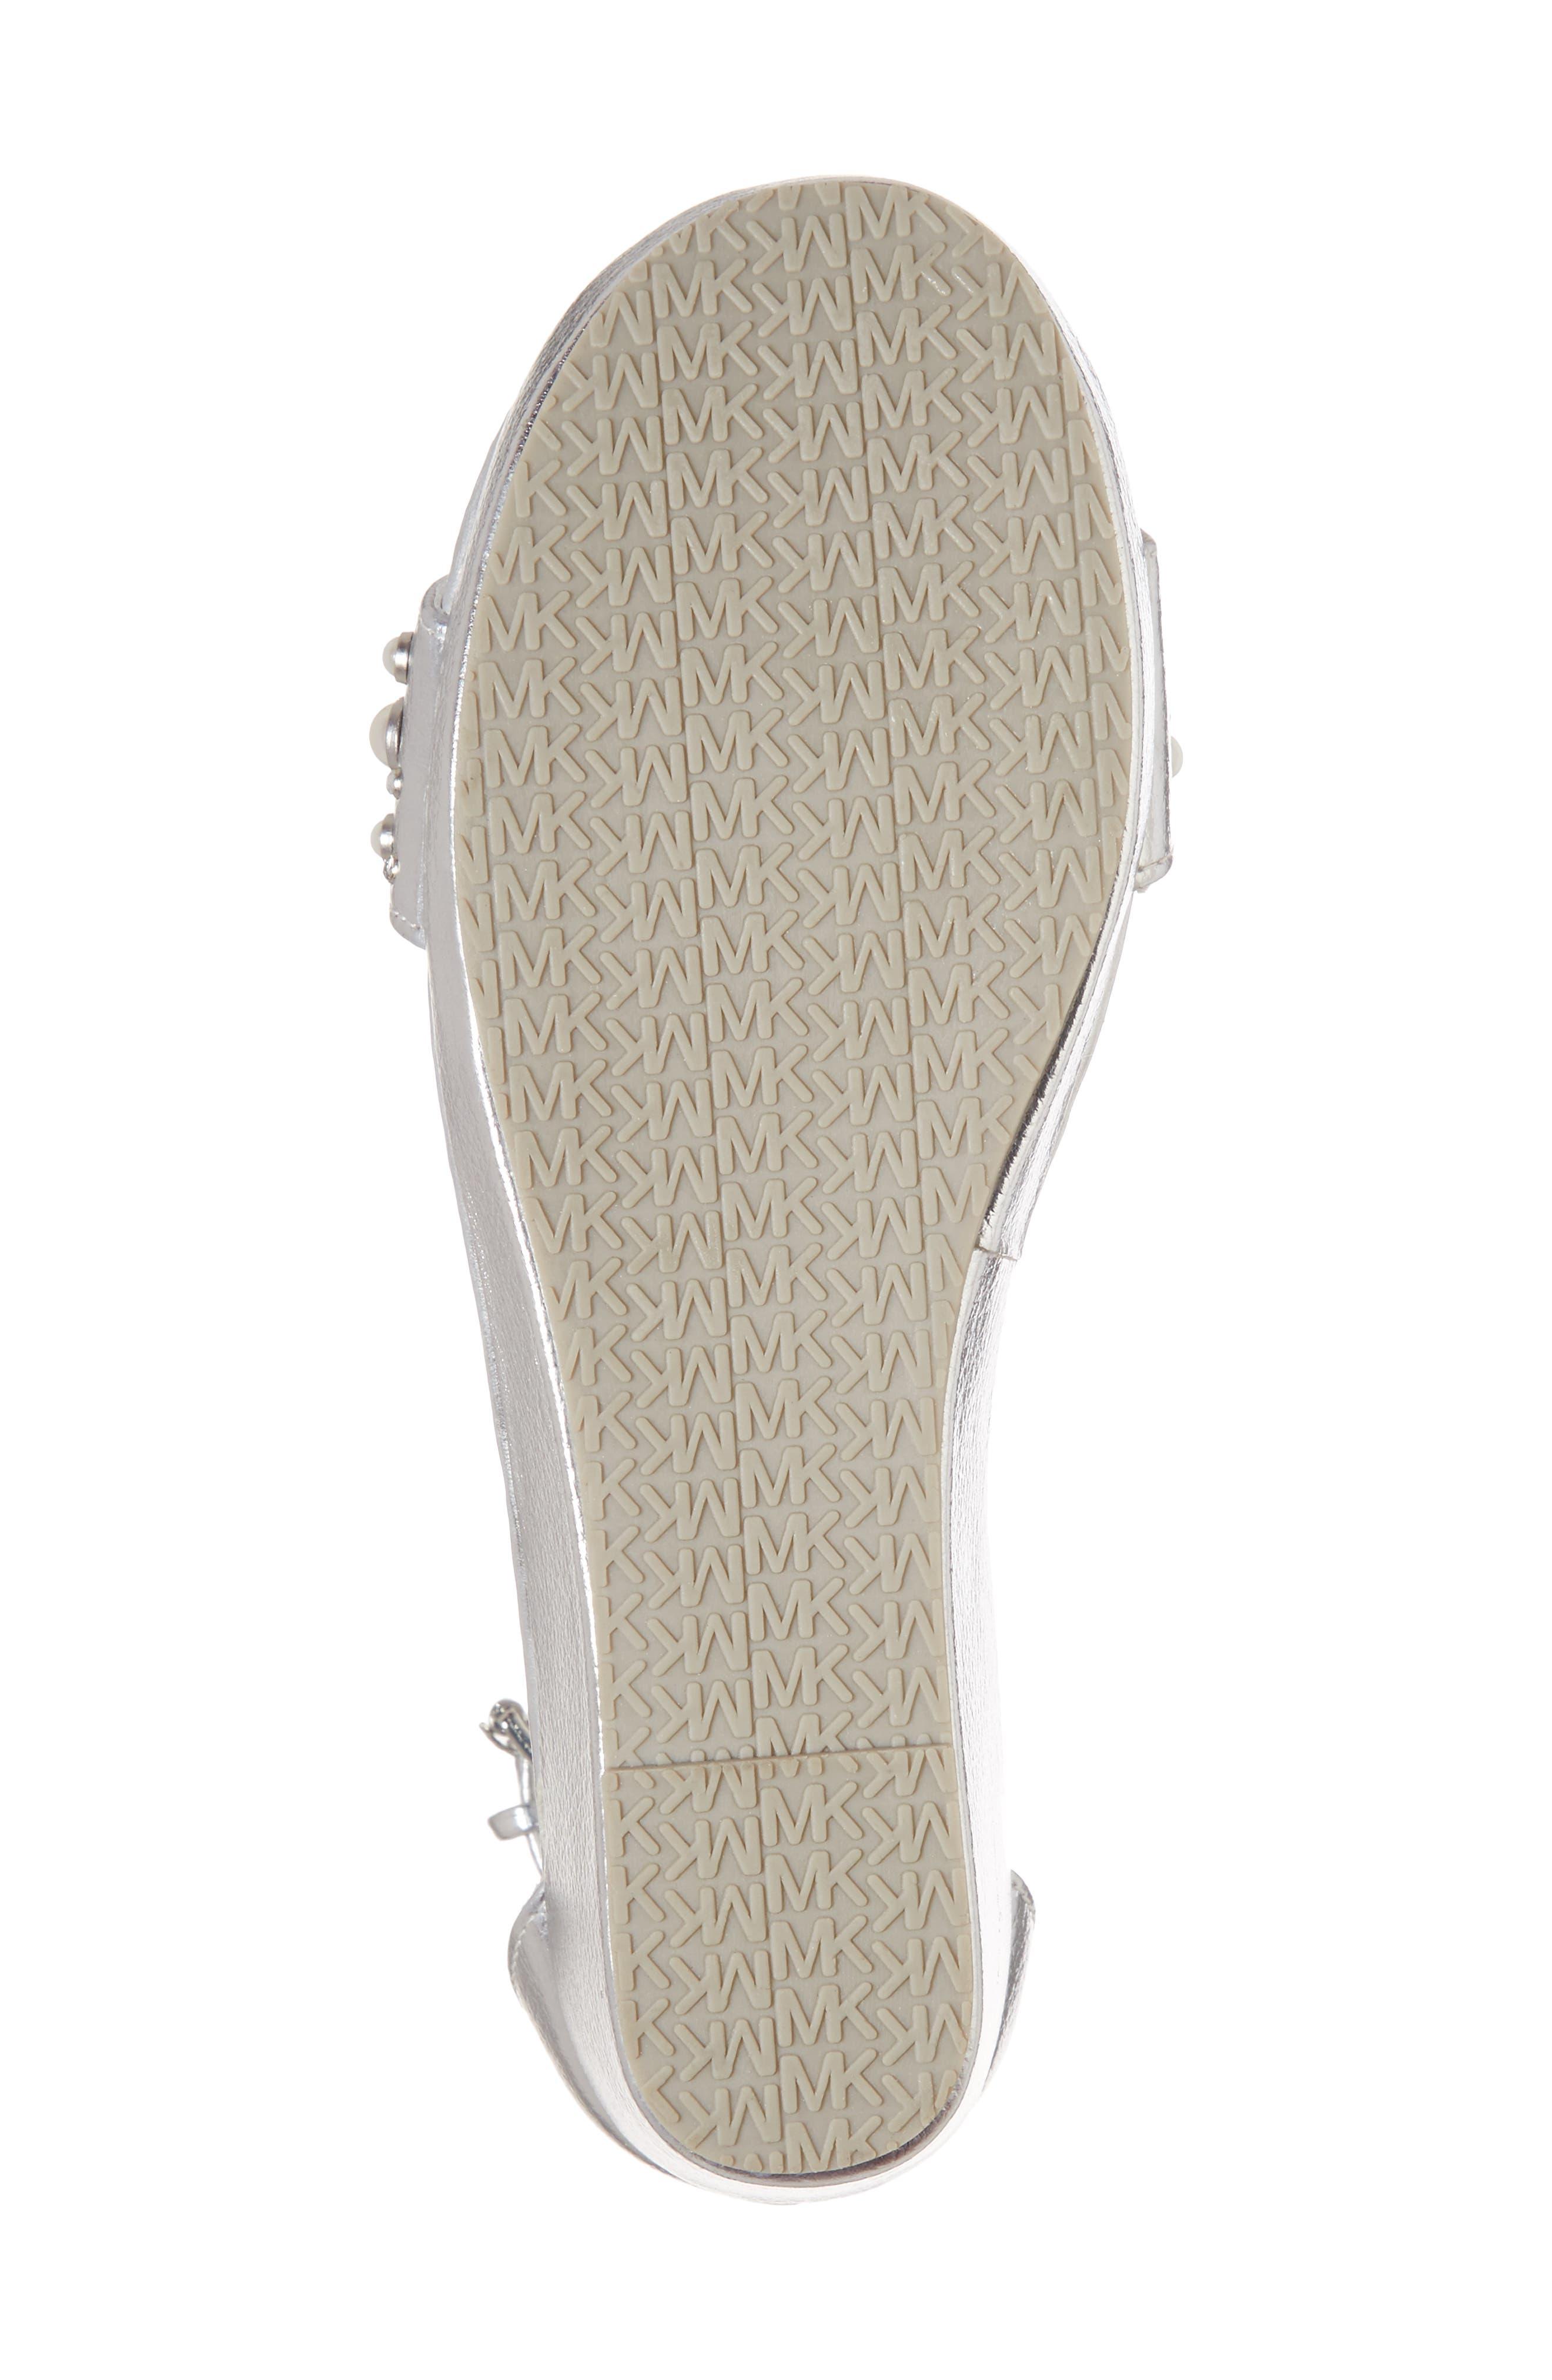 Cate Embellished Wedge Sandal,                             Alternate thumbnail 6, color,                             Silver